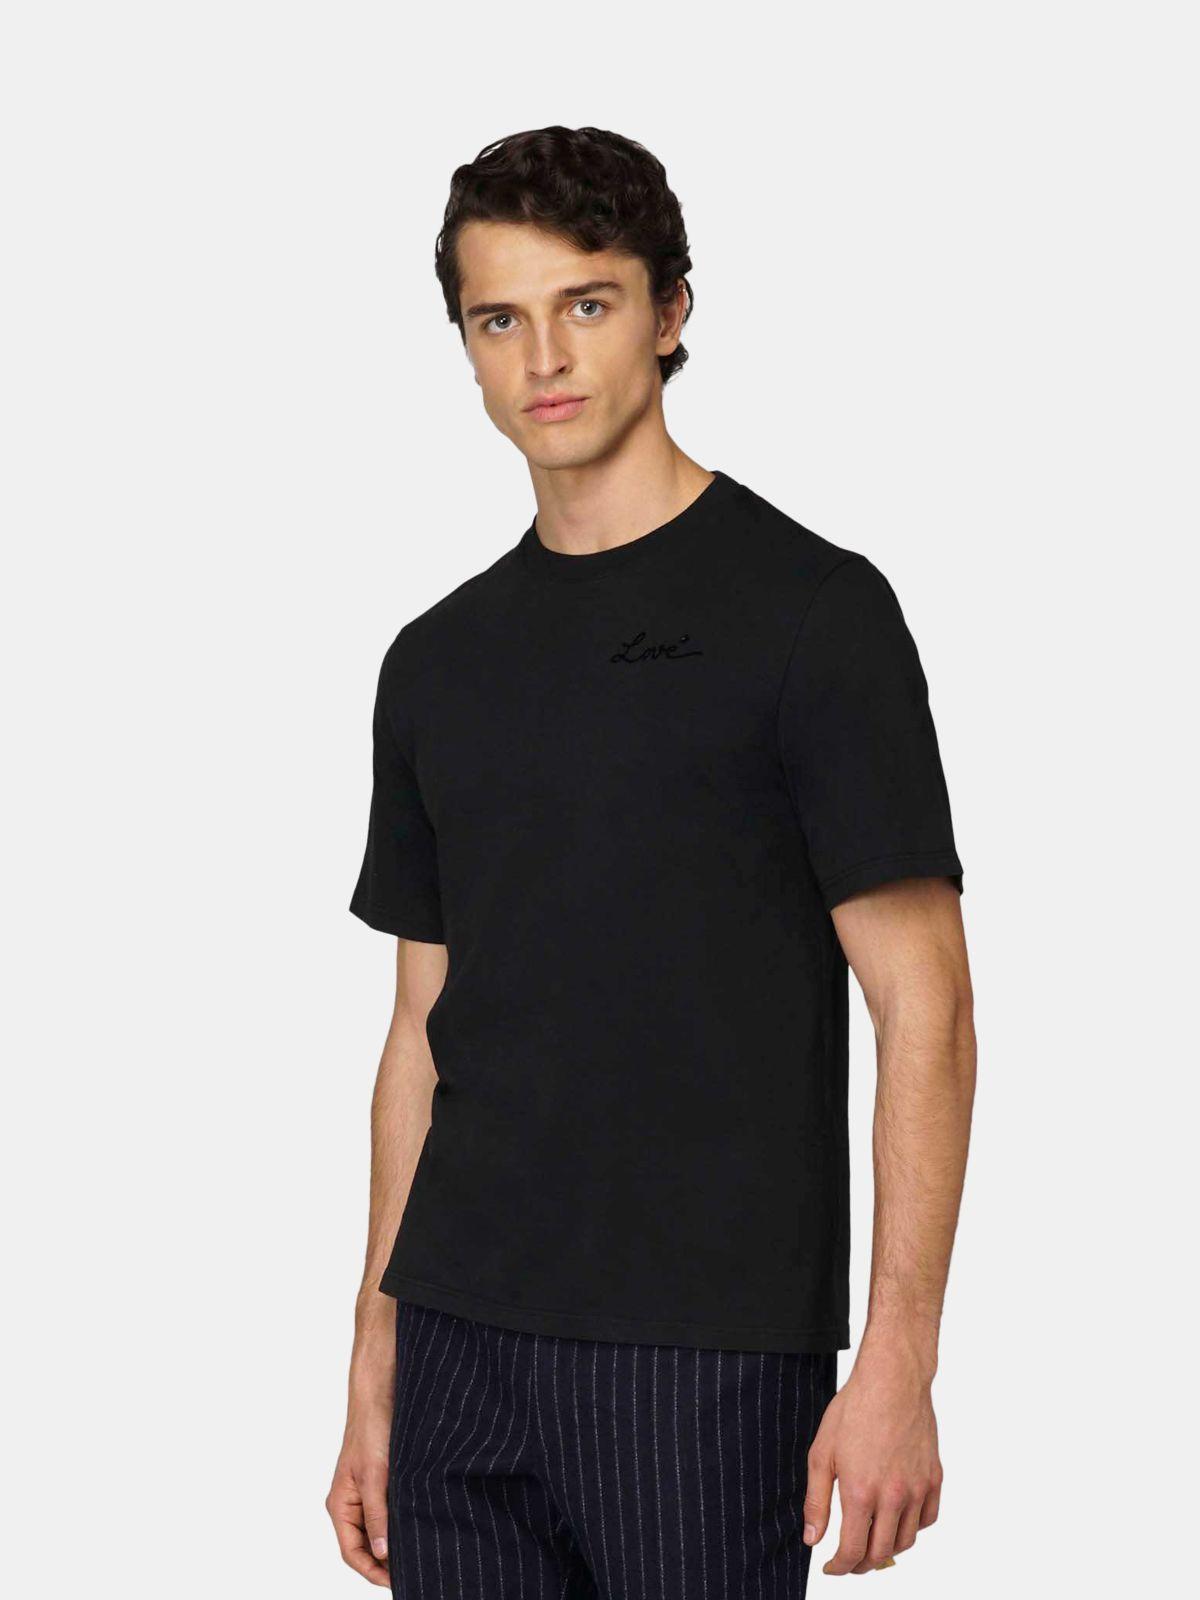 Golden Goose - T-shirt Golden nera con ricamo Love in